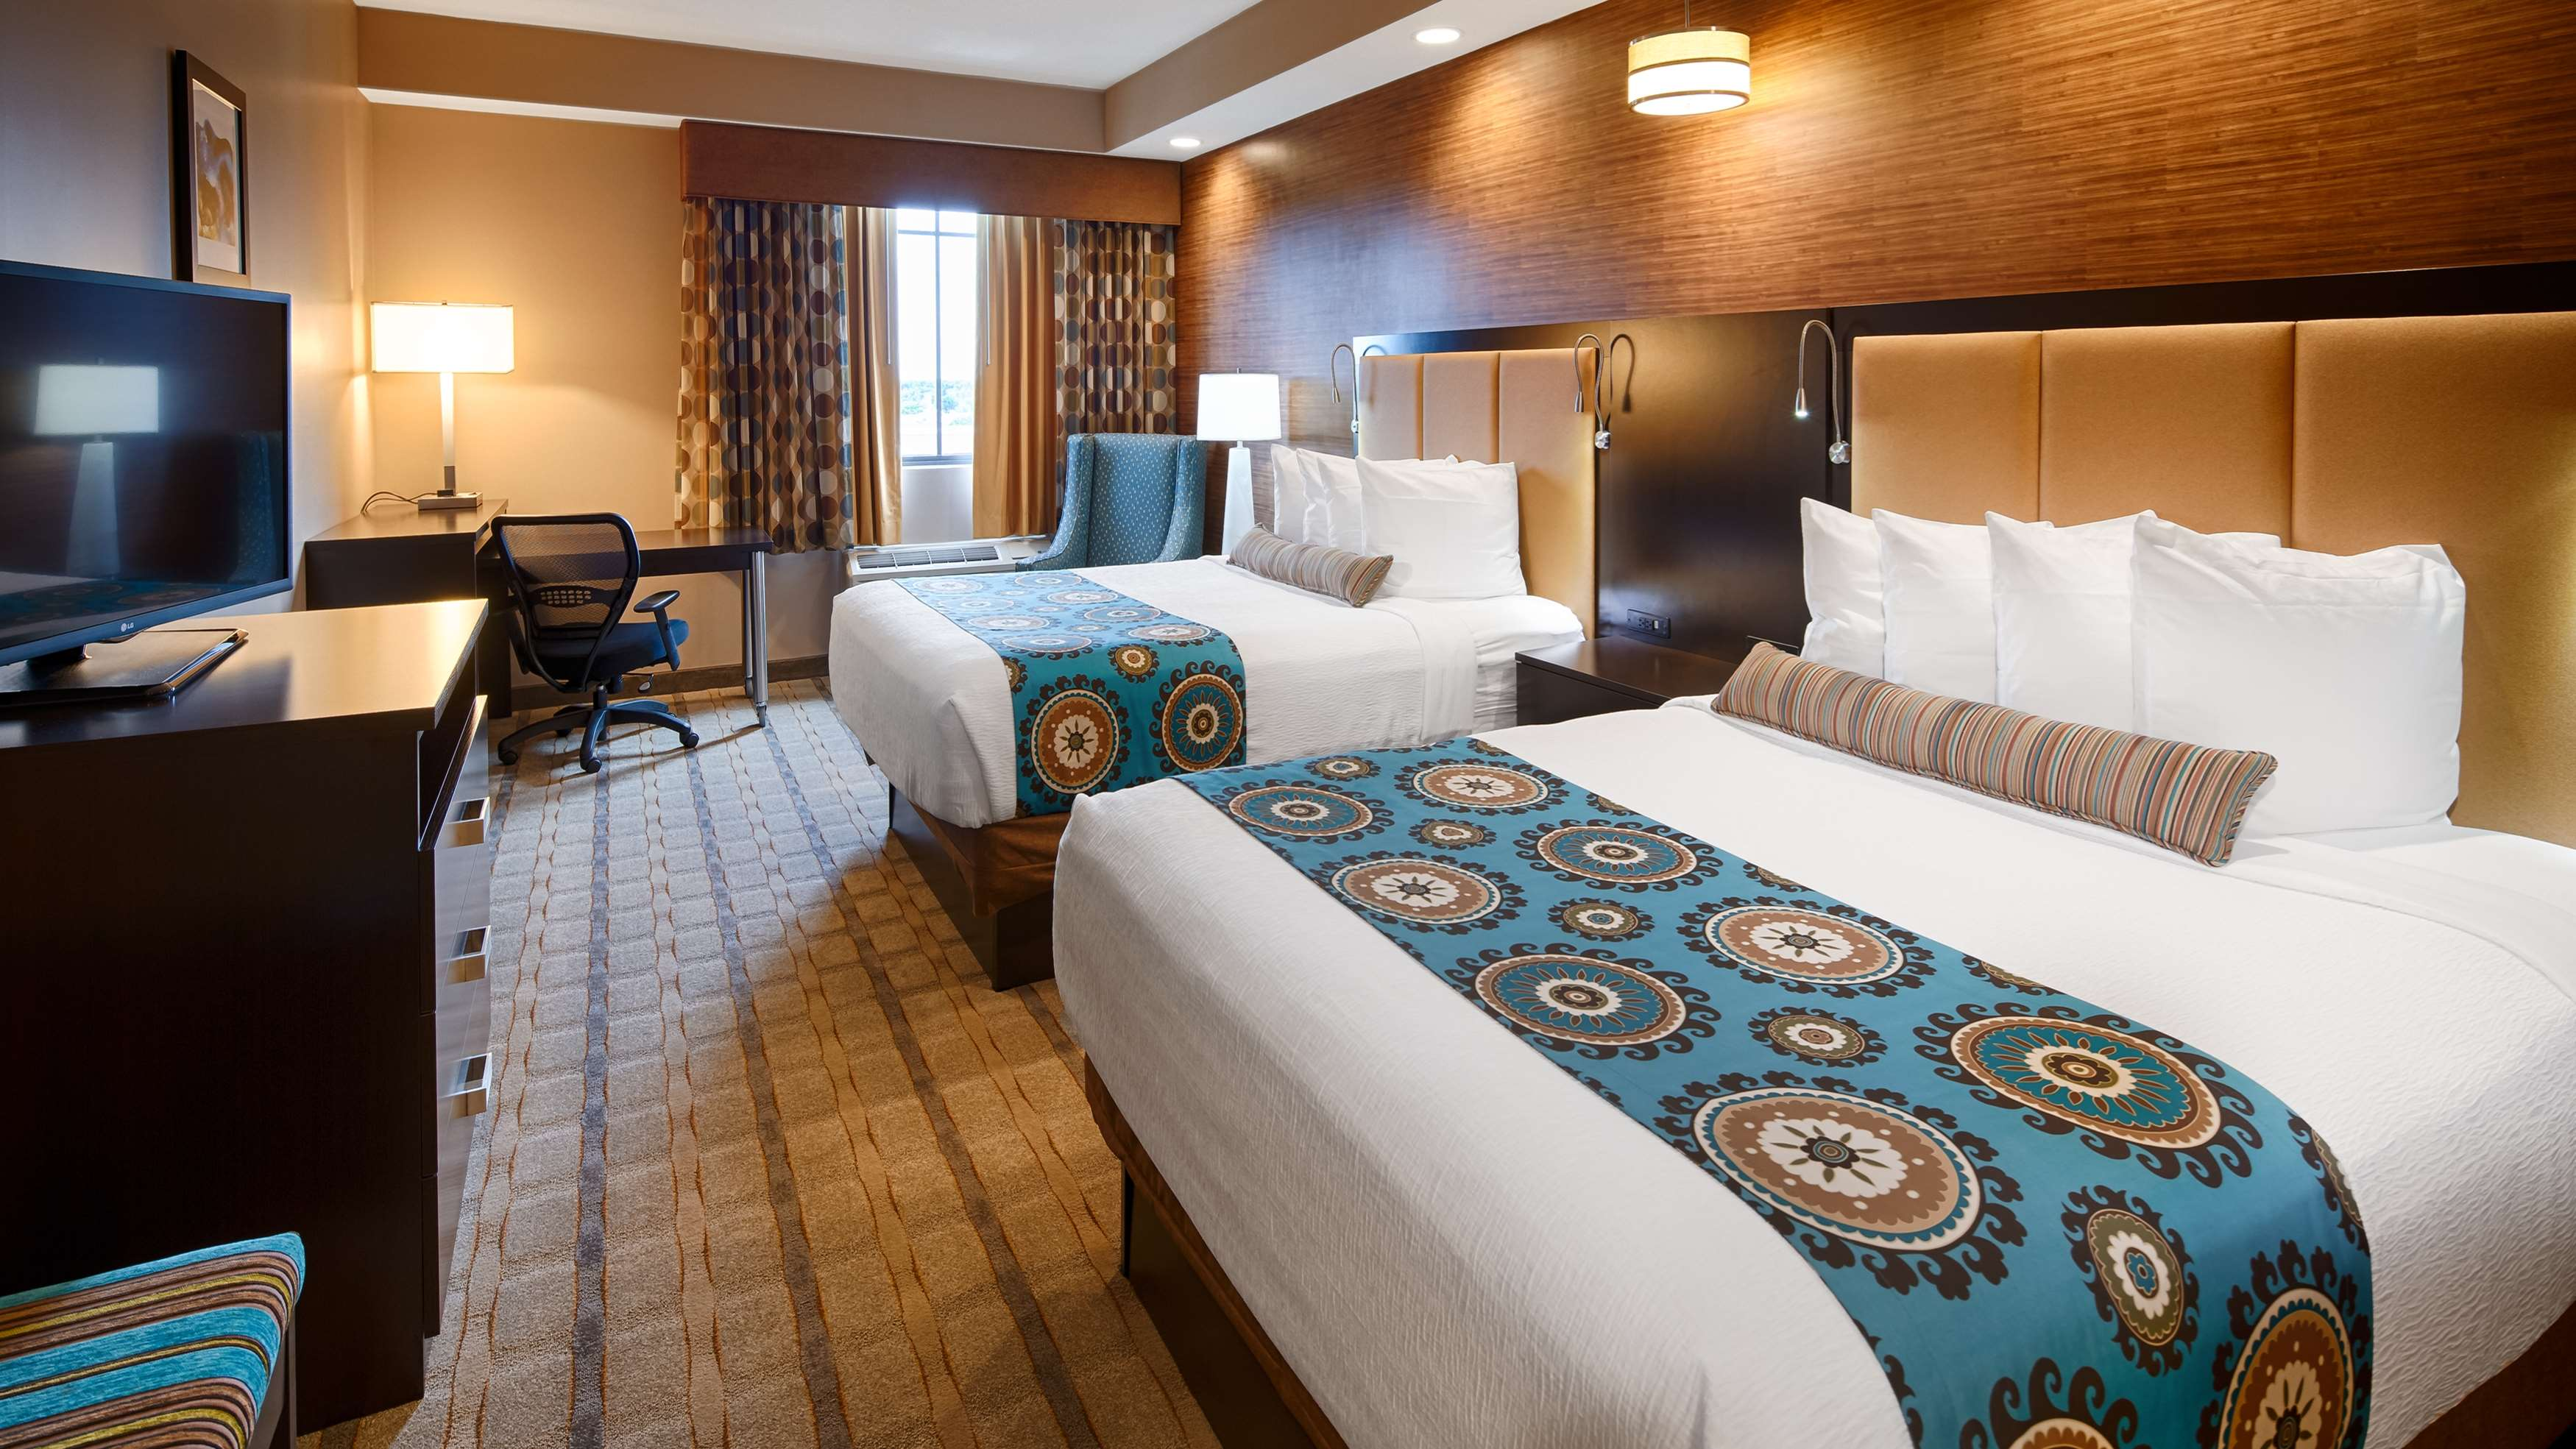 Best Western Plus Kendall Airport Hotel & Suites image 24